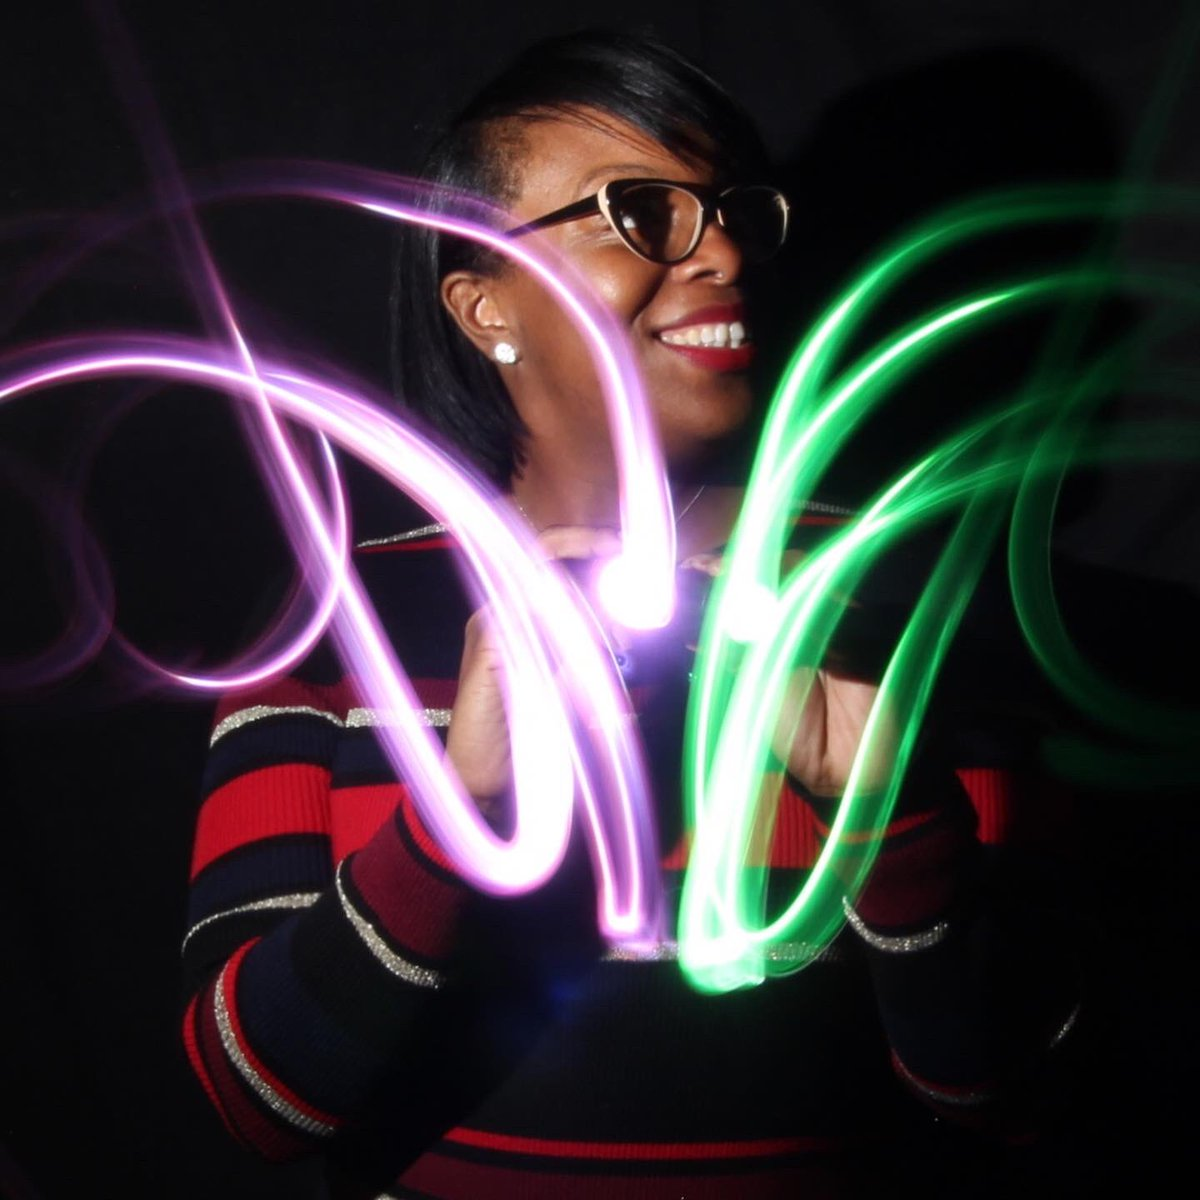 Holiday lights @ @arts4learning holiday gathering 2019! #lightpainting #nofilter #artsintegration